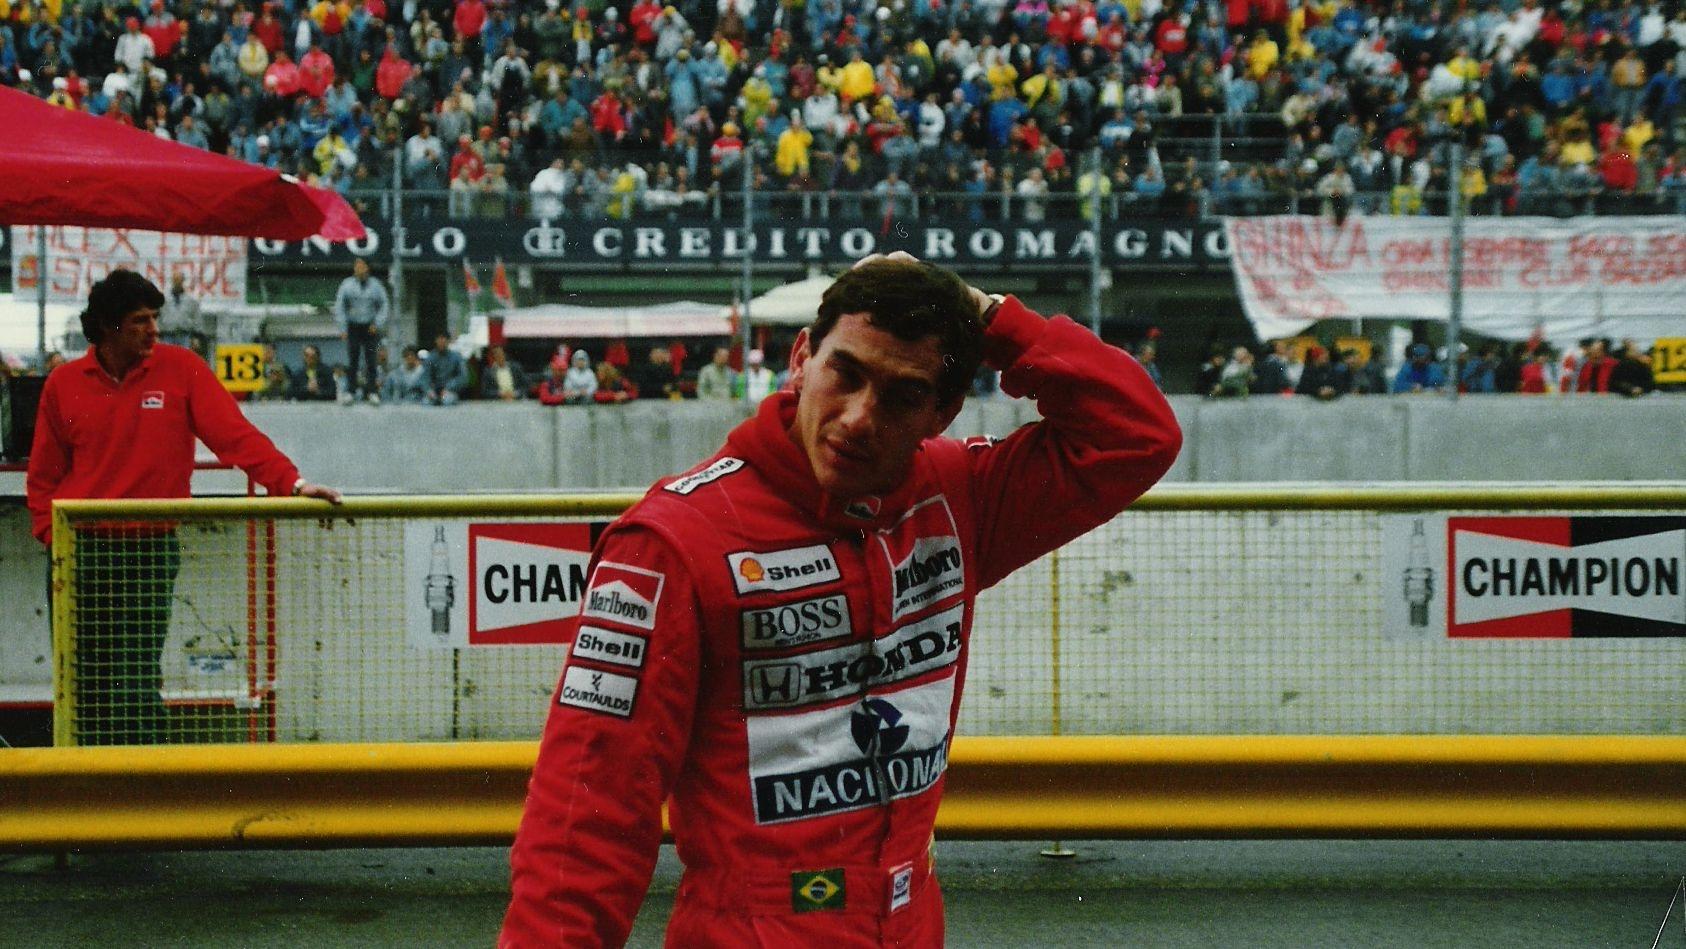 Ayrton Senna: Brazil Mourns 'Superhero' 25 Years After His Death